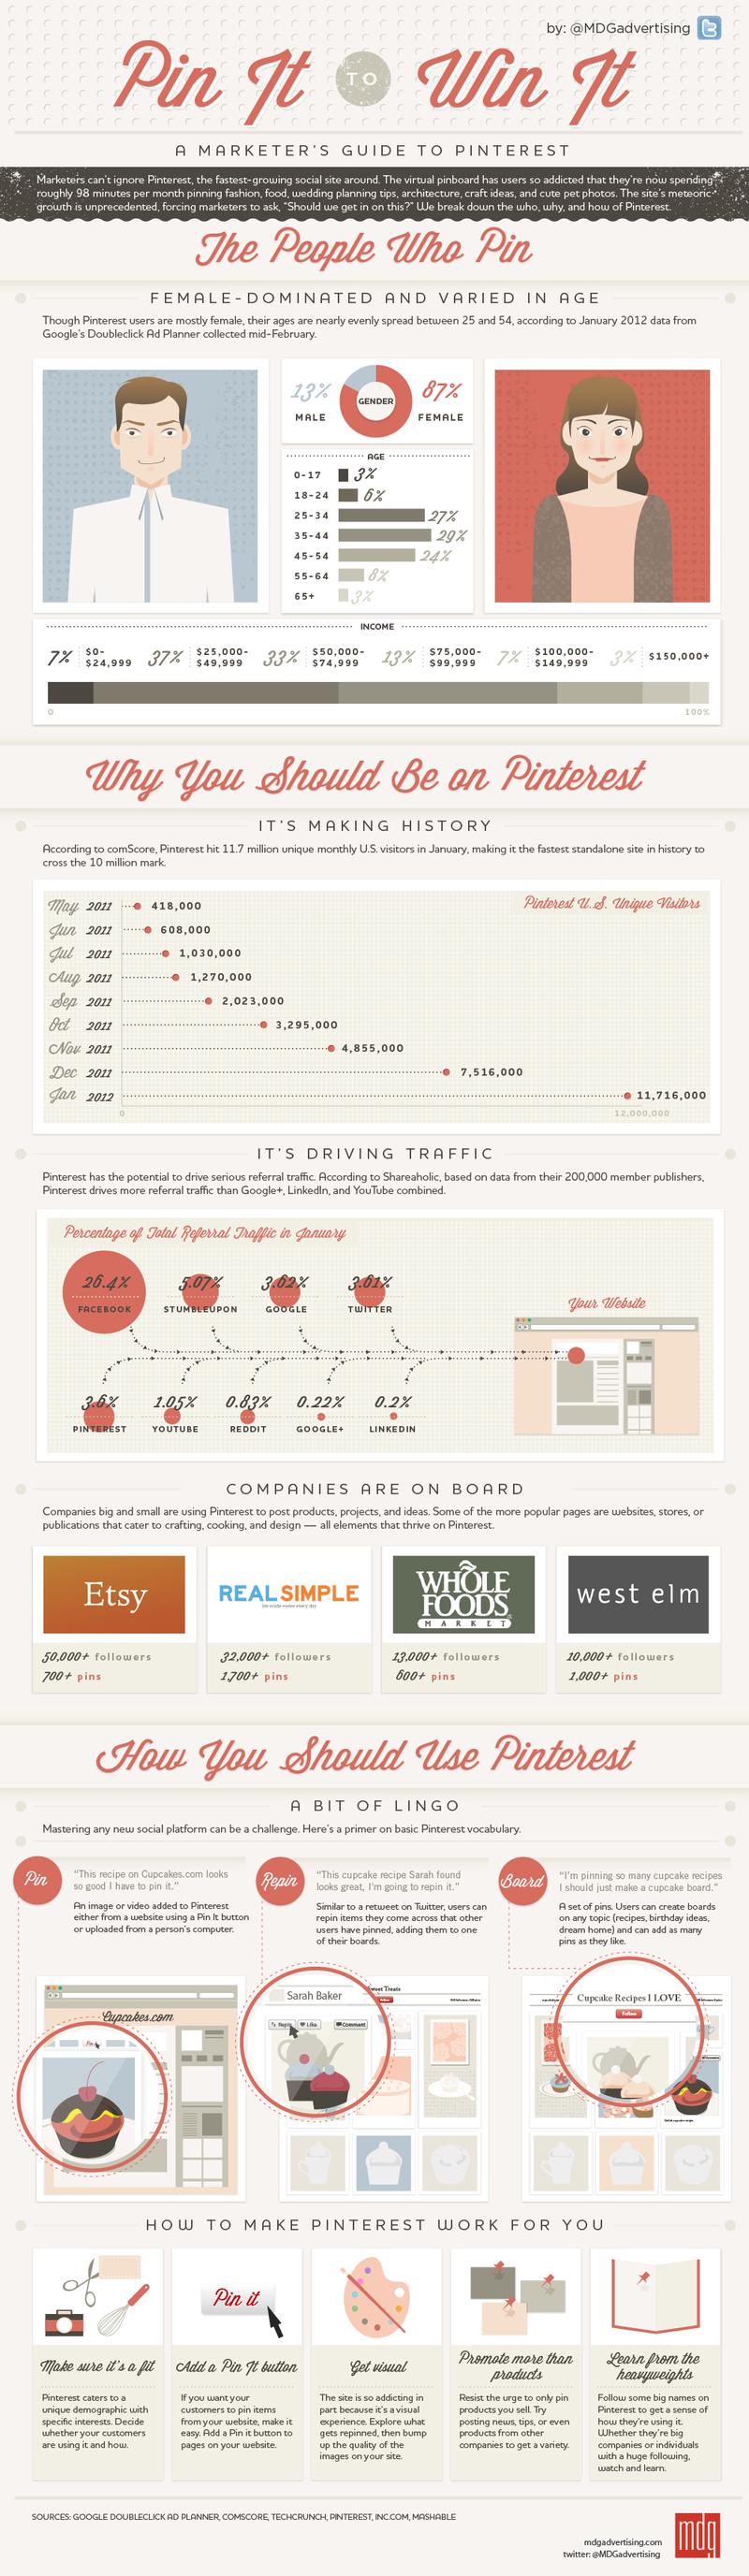 Infographic-pinterest